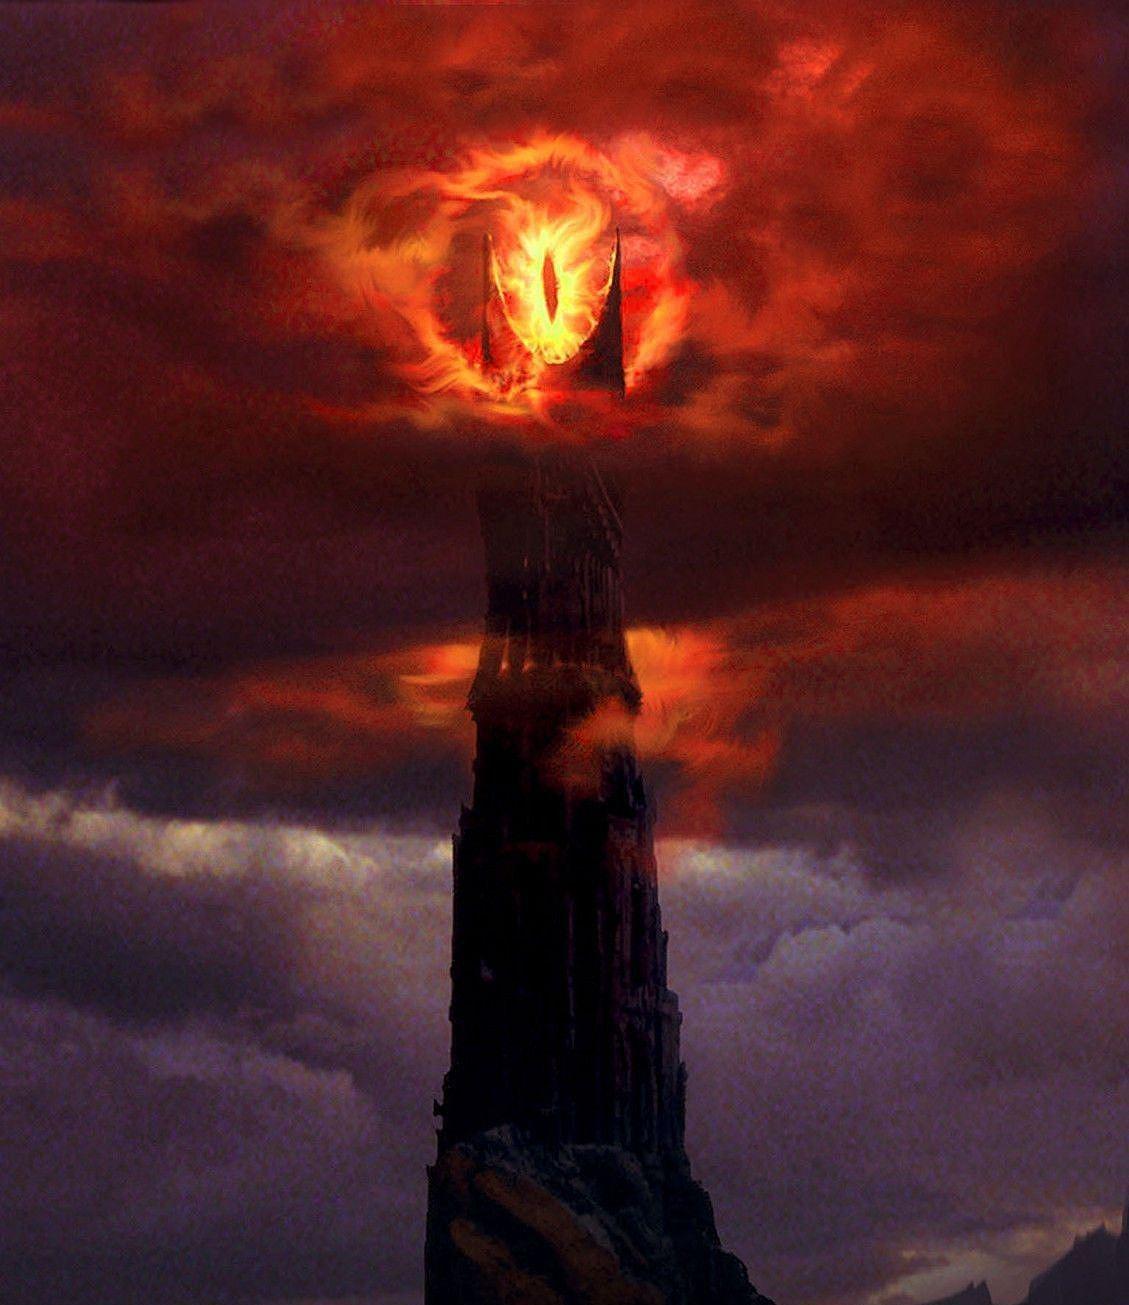 lotr_eye_of_sauron_5g_tower